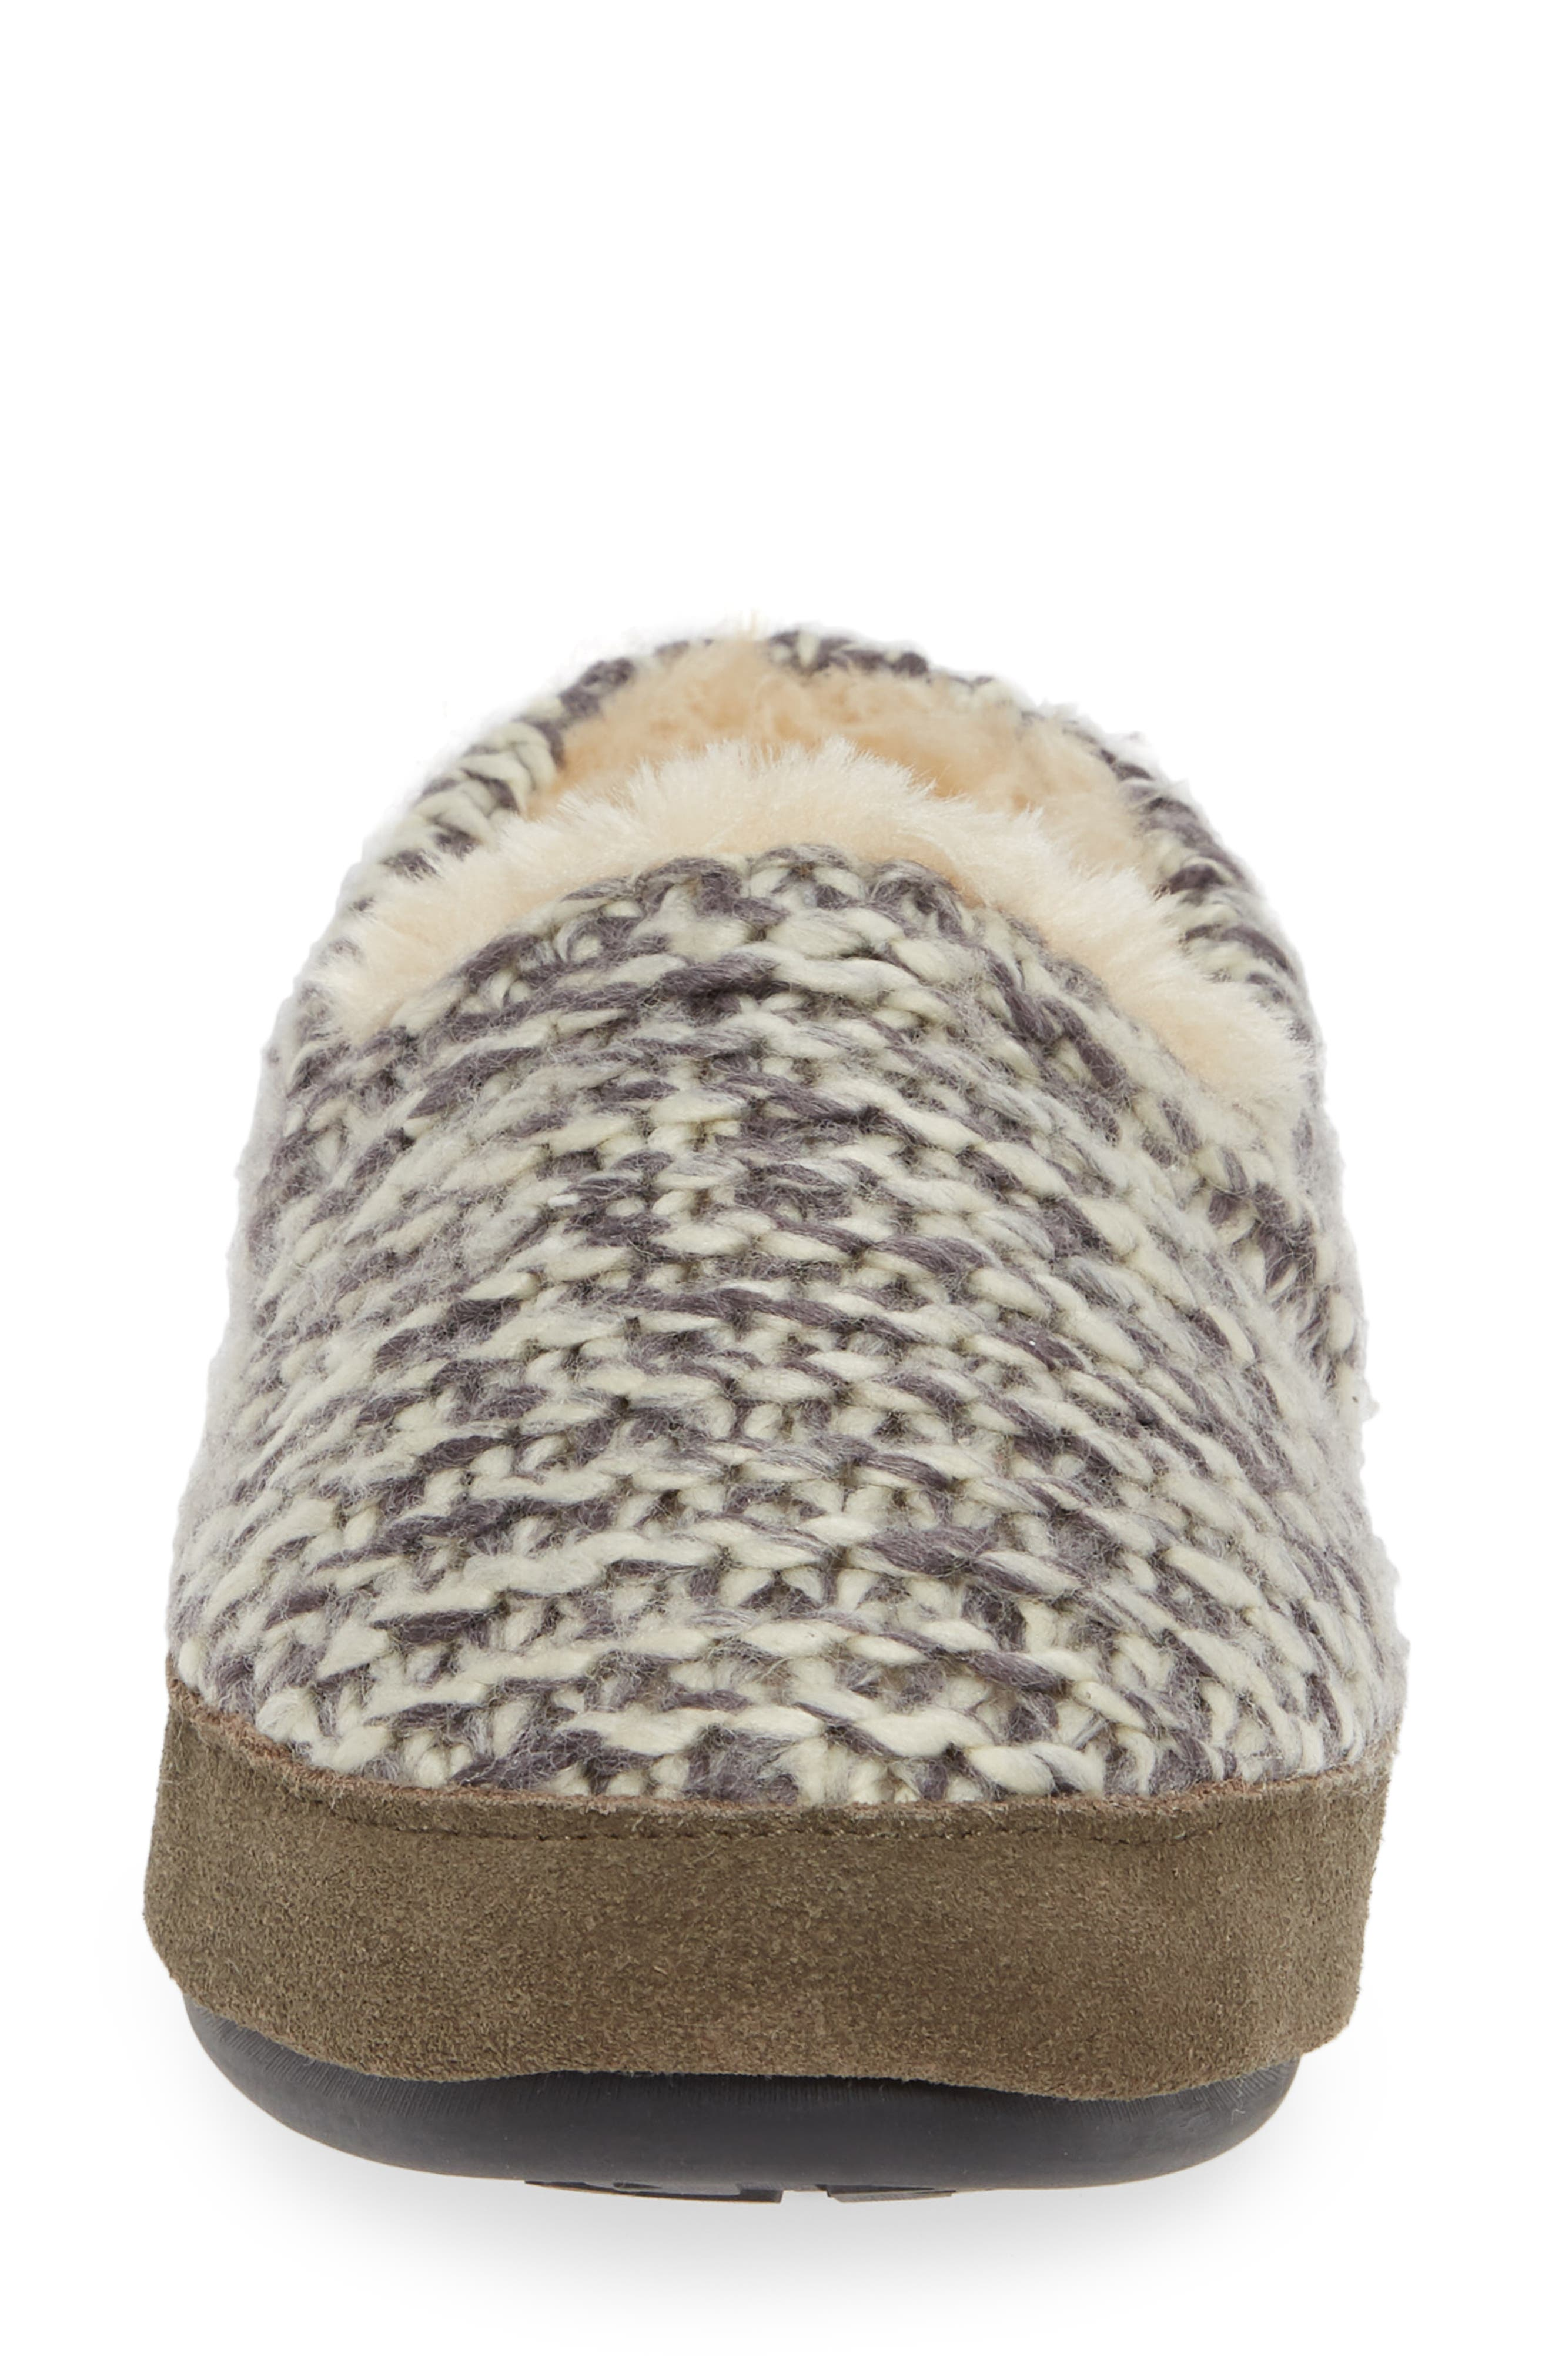 Whitecap Knit Slipper,                             Alternate thumbnail 4, color,                             WARM NEUTRAL FABRIC